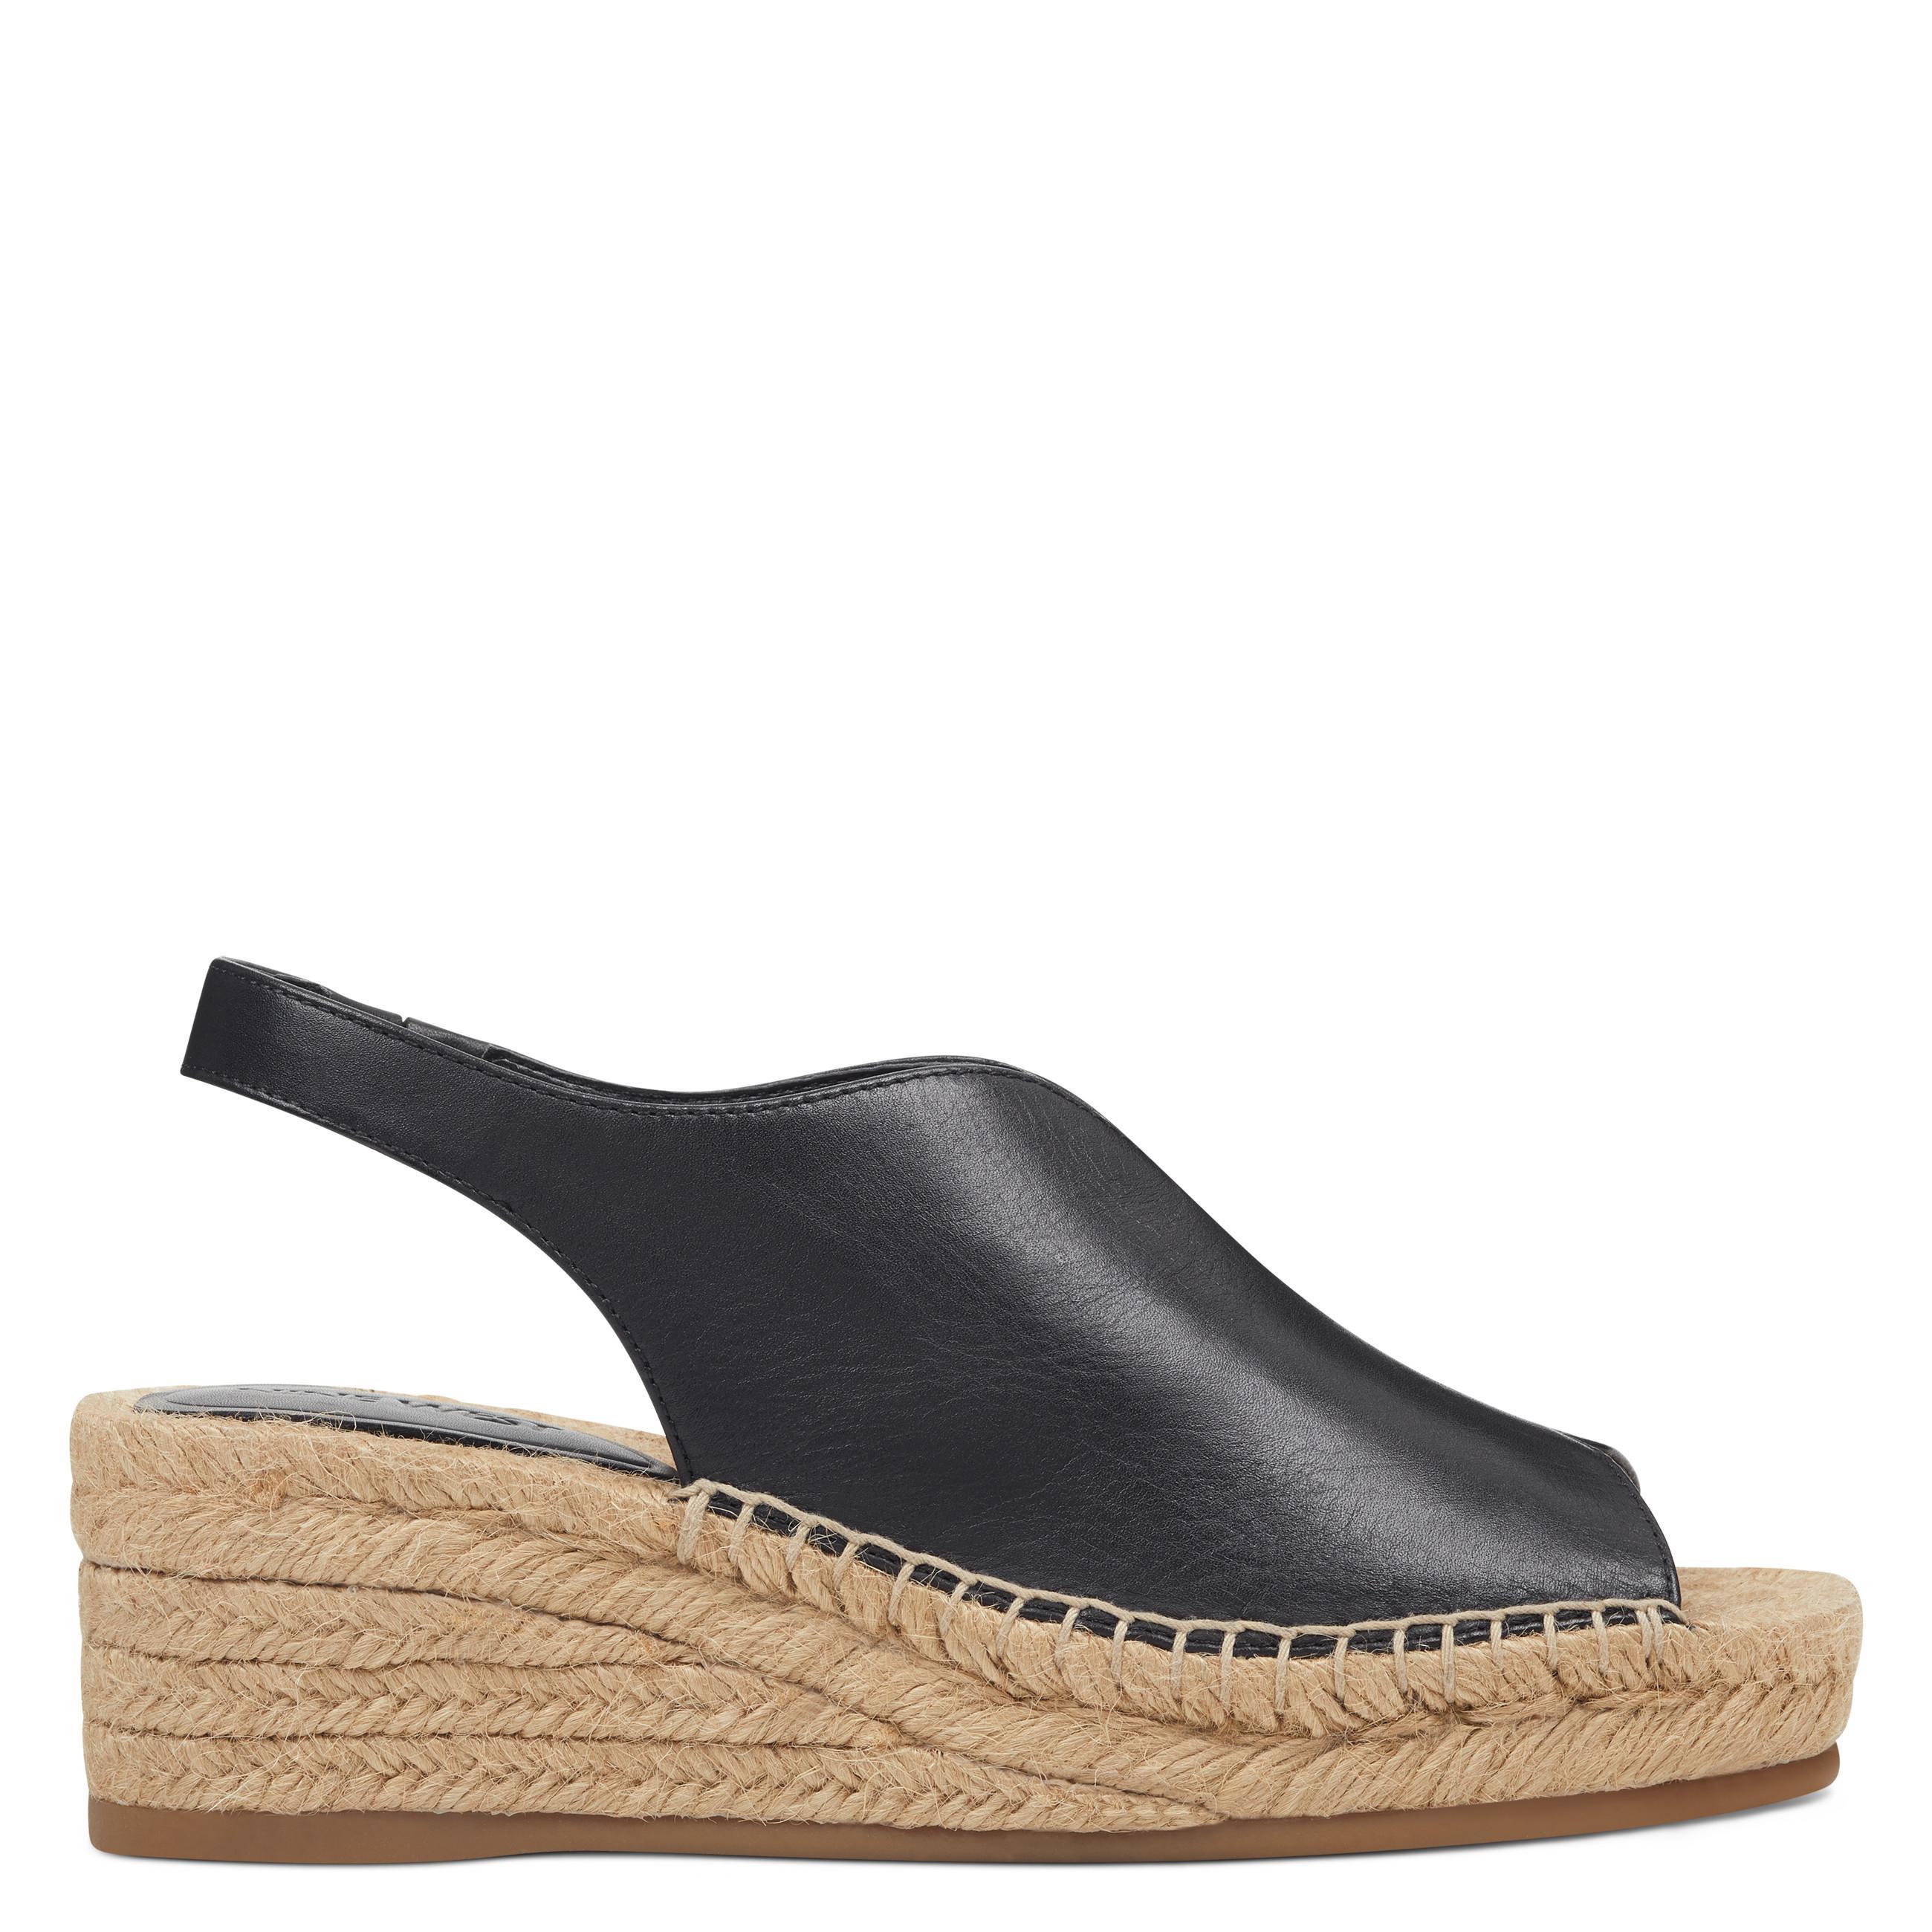 7fb04704a96 Lyst - Nine West Eezu Espadrille Sandals in Black - Save 56%